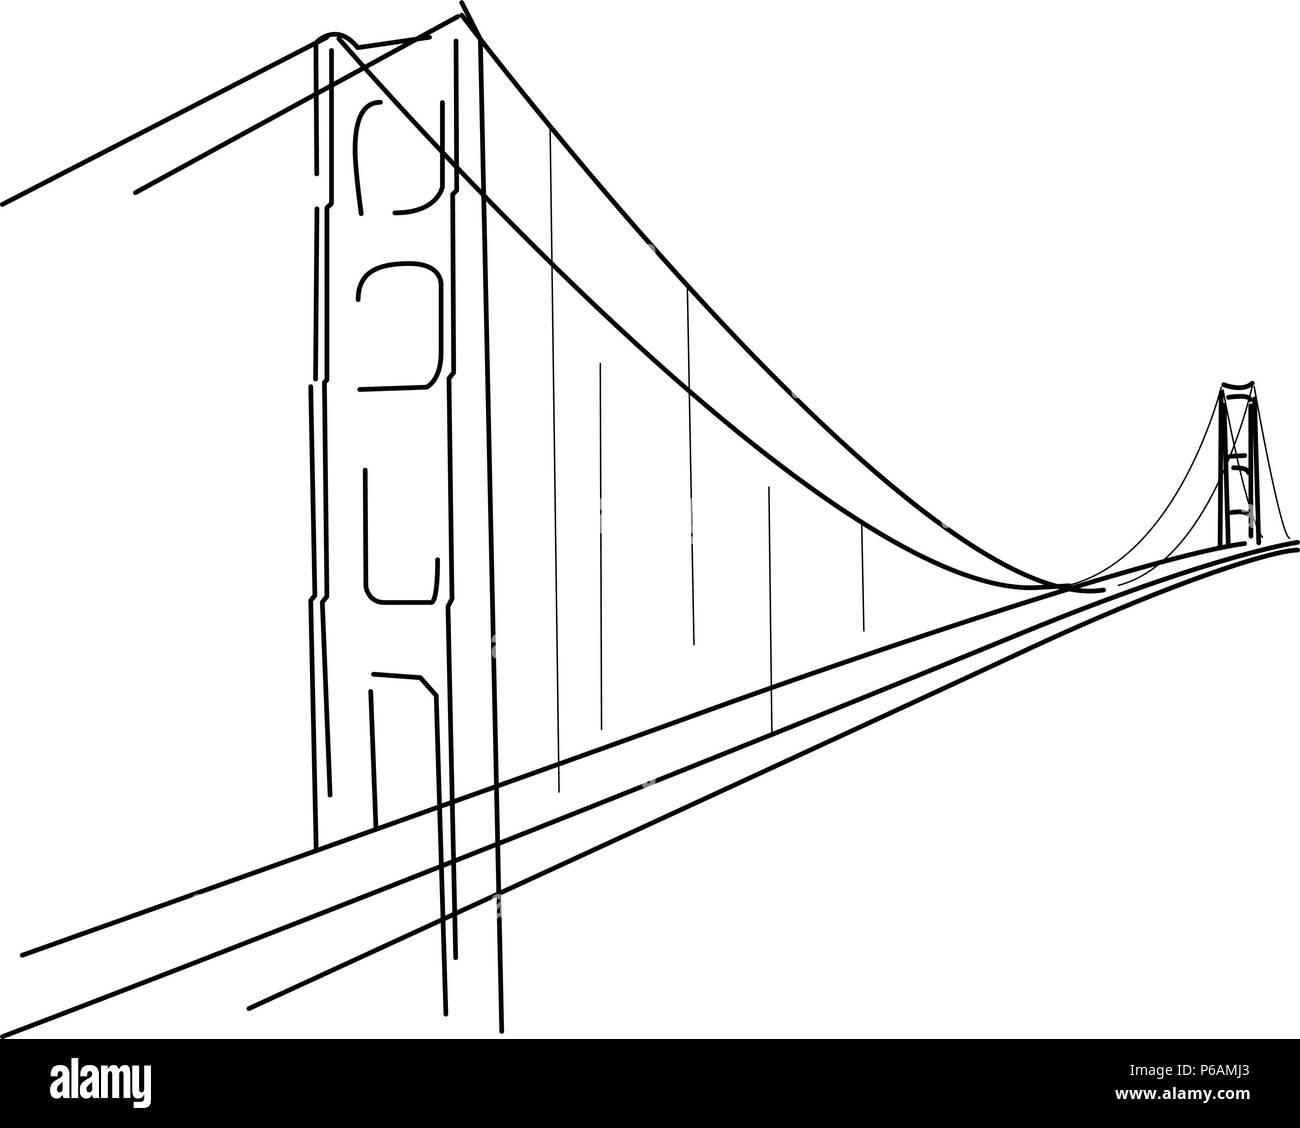 Bridge Stock Vector Images - Page 2 - Alamy